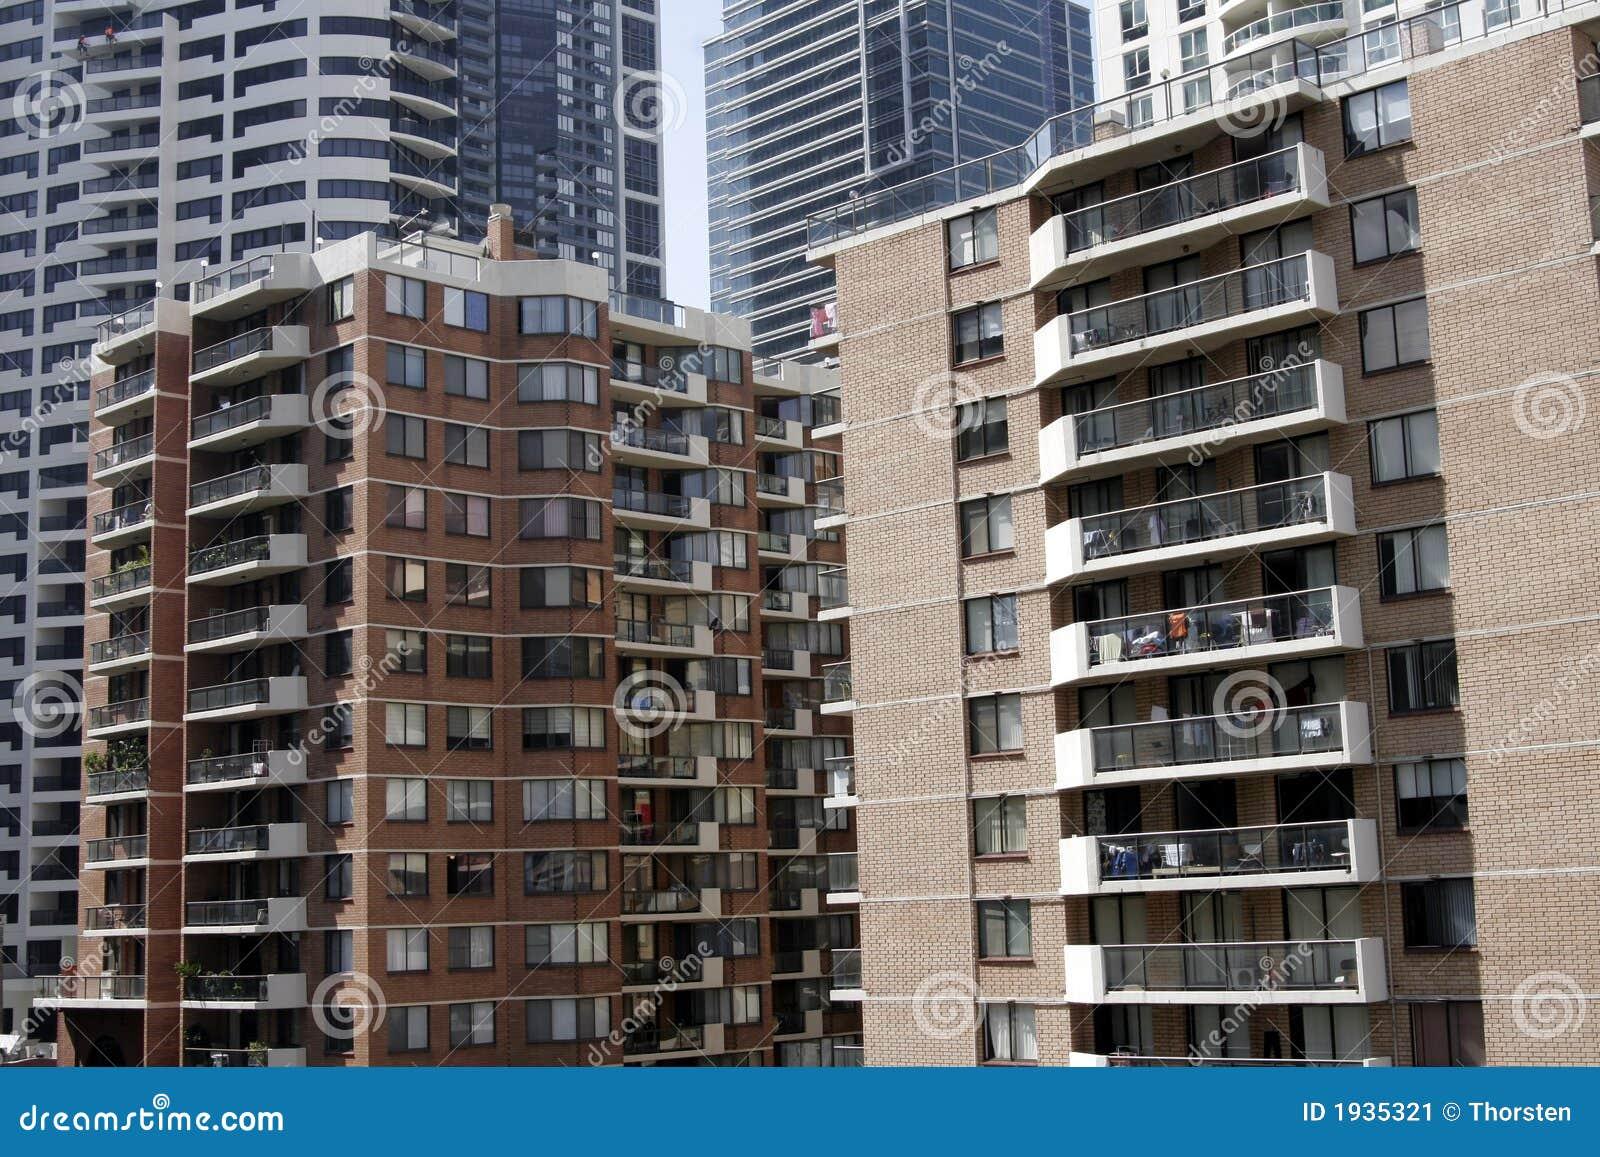 Urban Apartment Building Stock Image - Image: 1935321